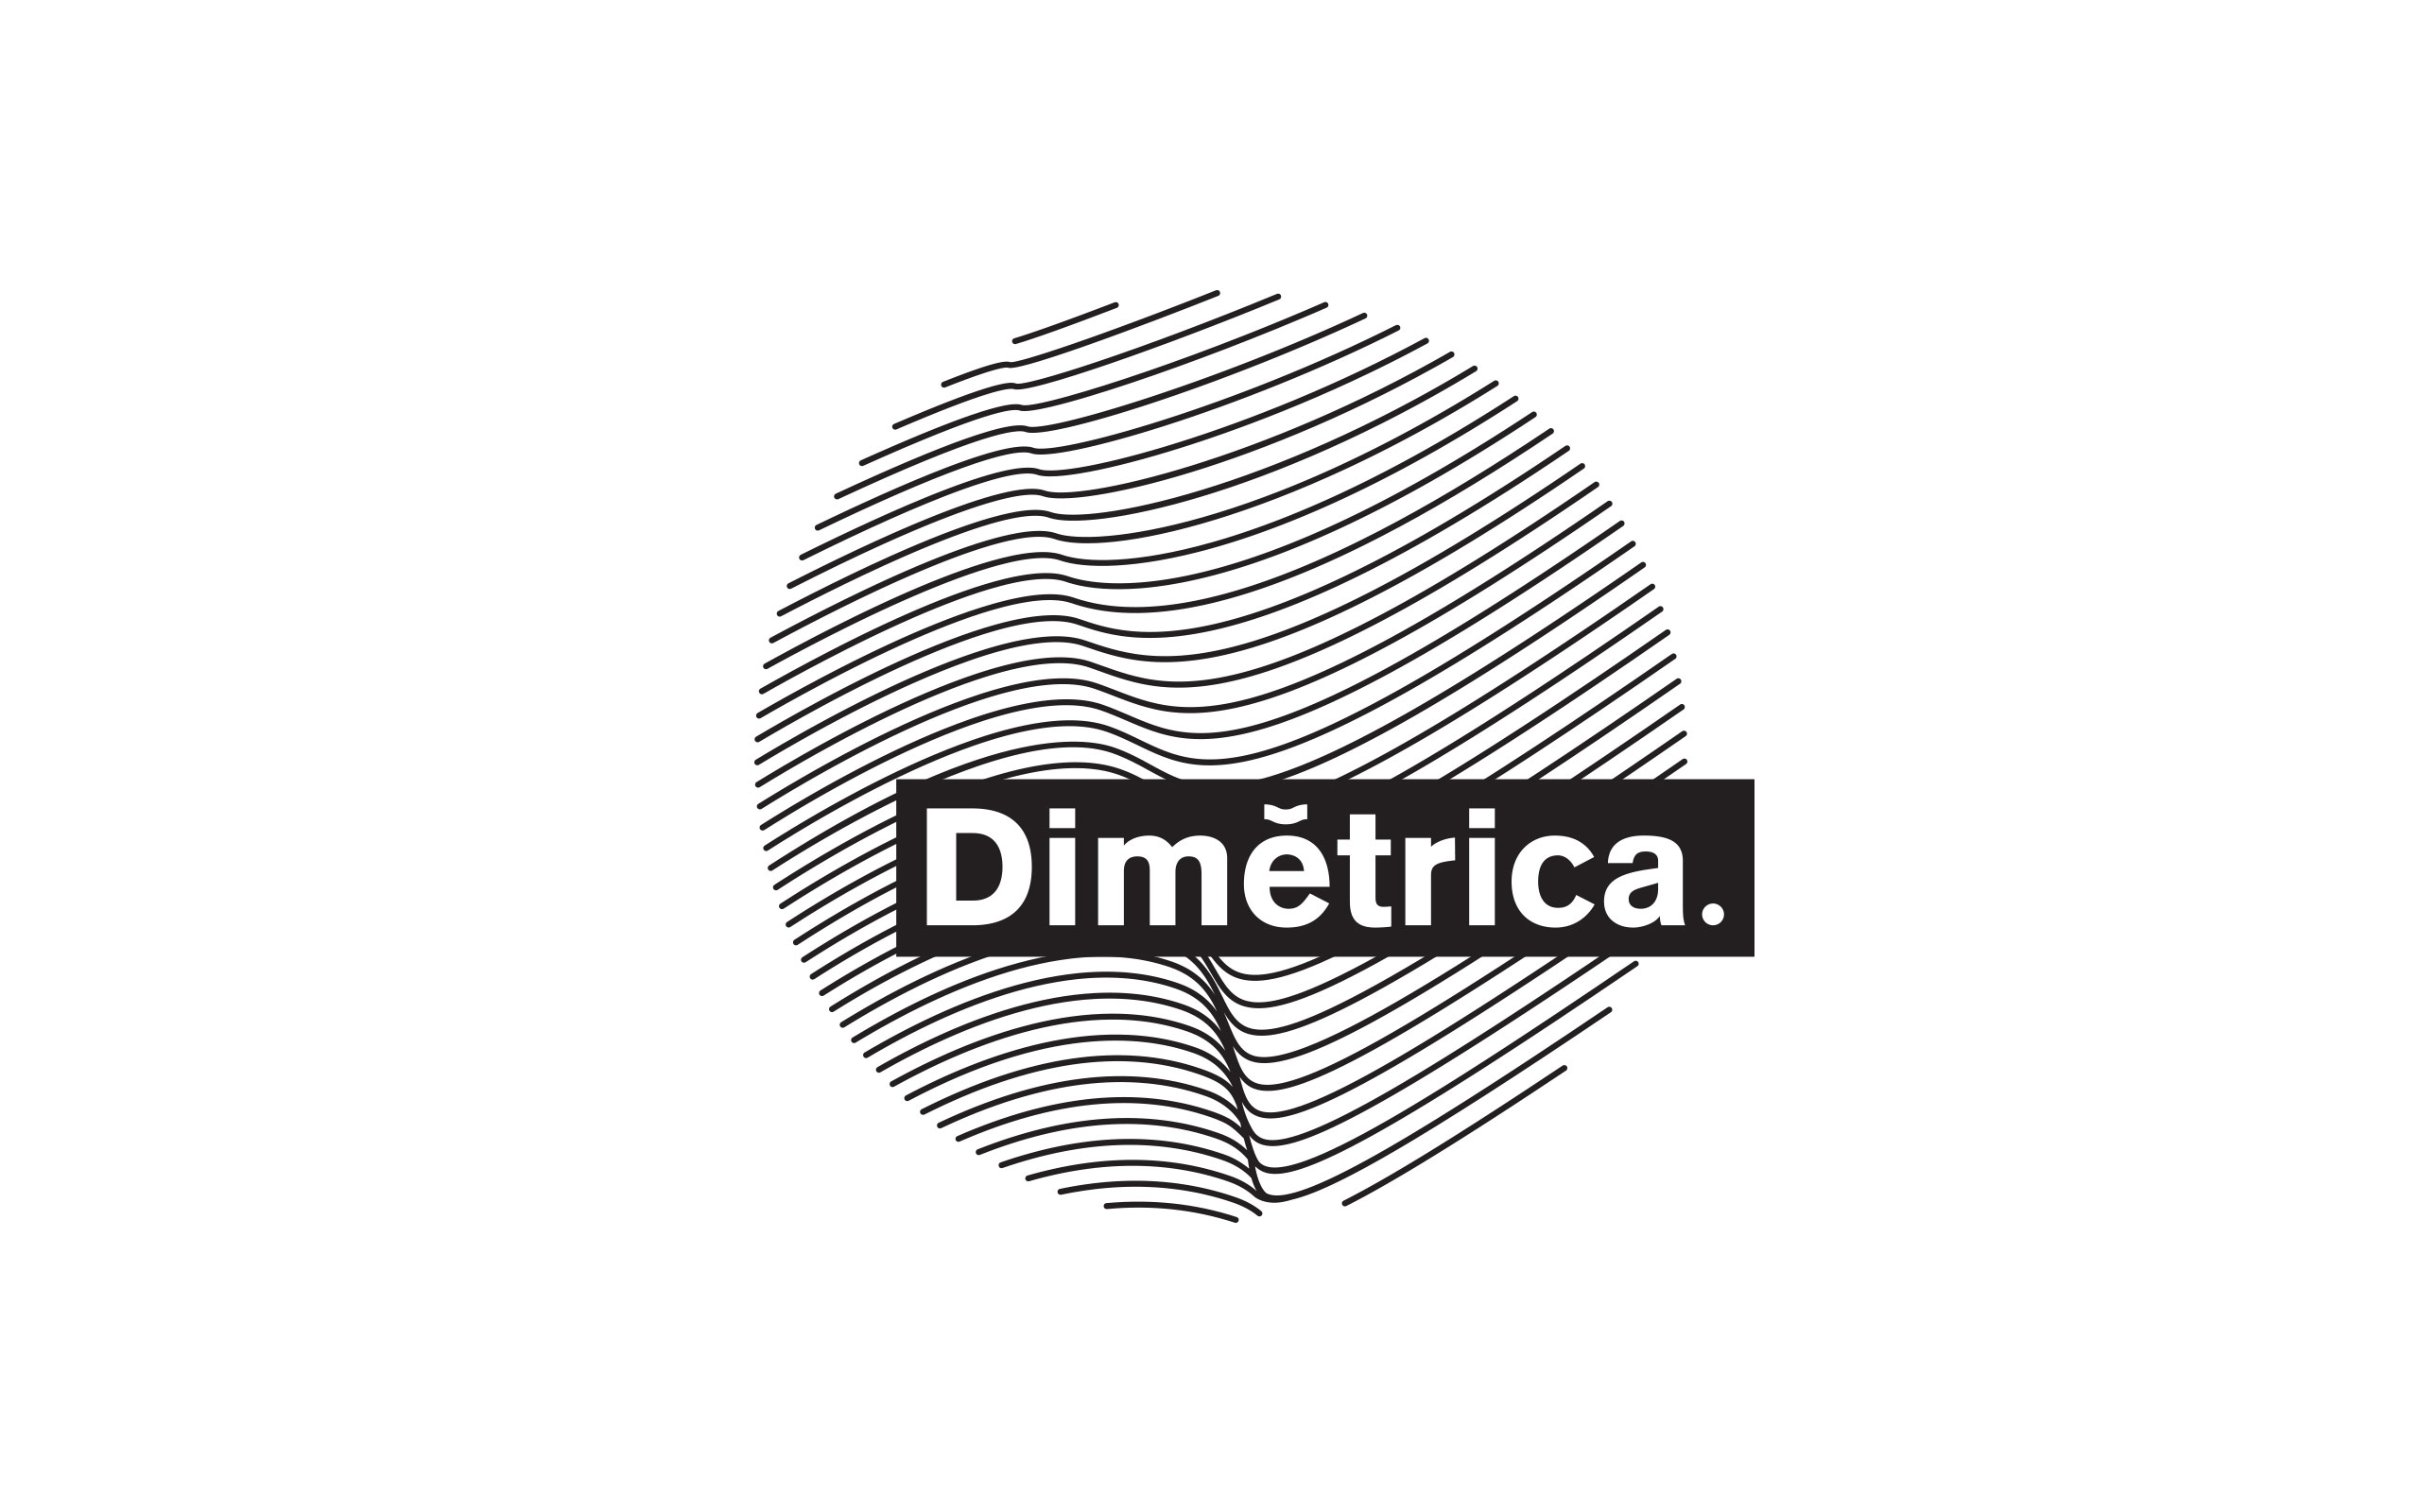 Dimetrica_09